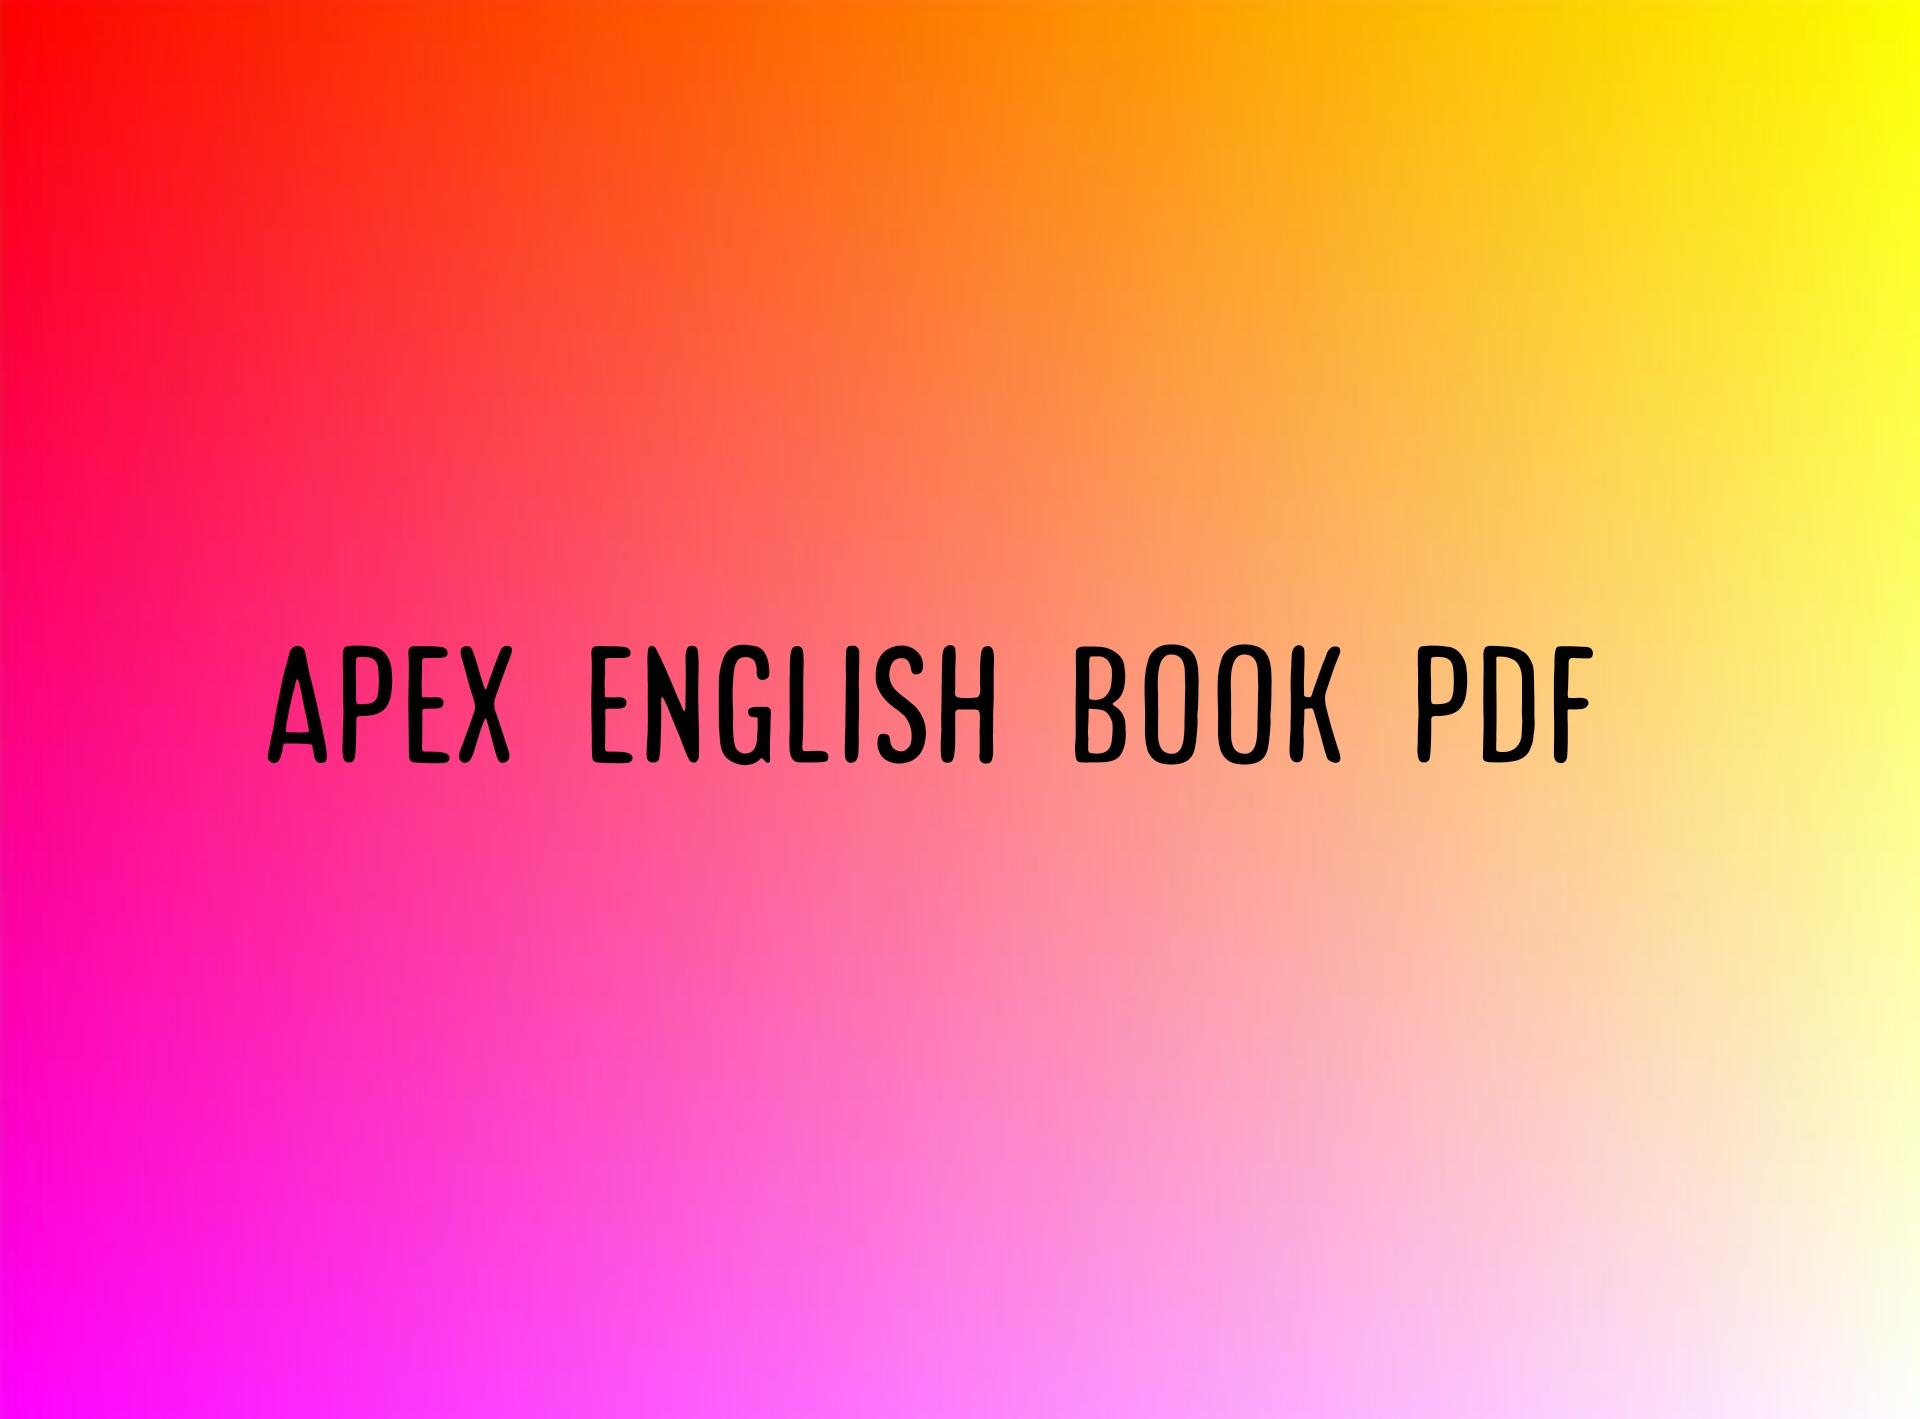 apex english book pdf download link, apex english book pdf, apex english book pdf, apex english book